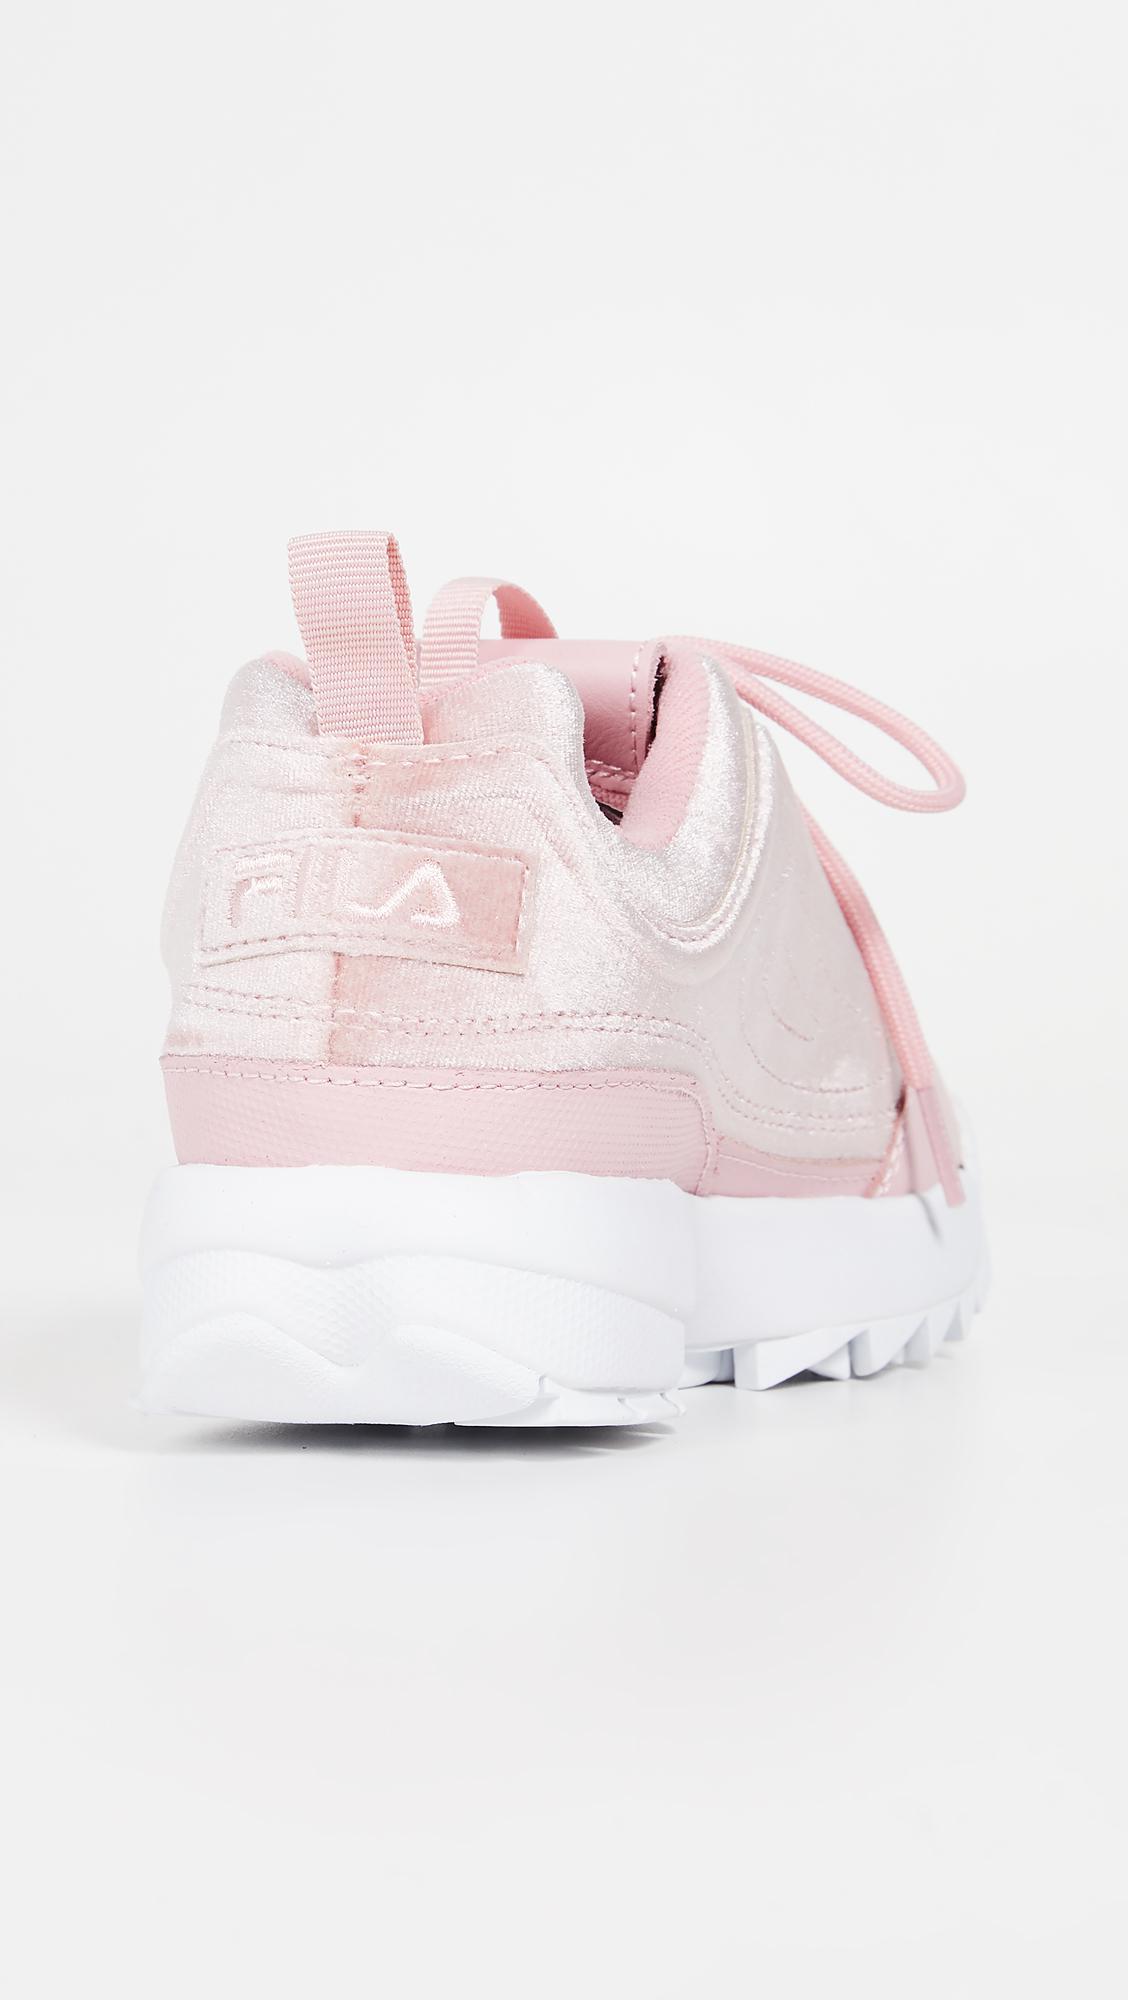 2fdddae560 Fila Disruptor Ii Premium Velour Sneakers in Pink - Lyst